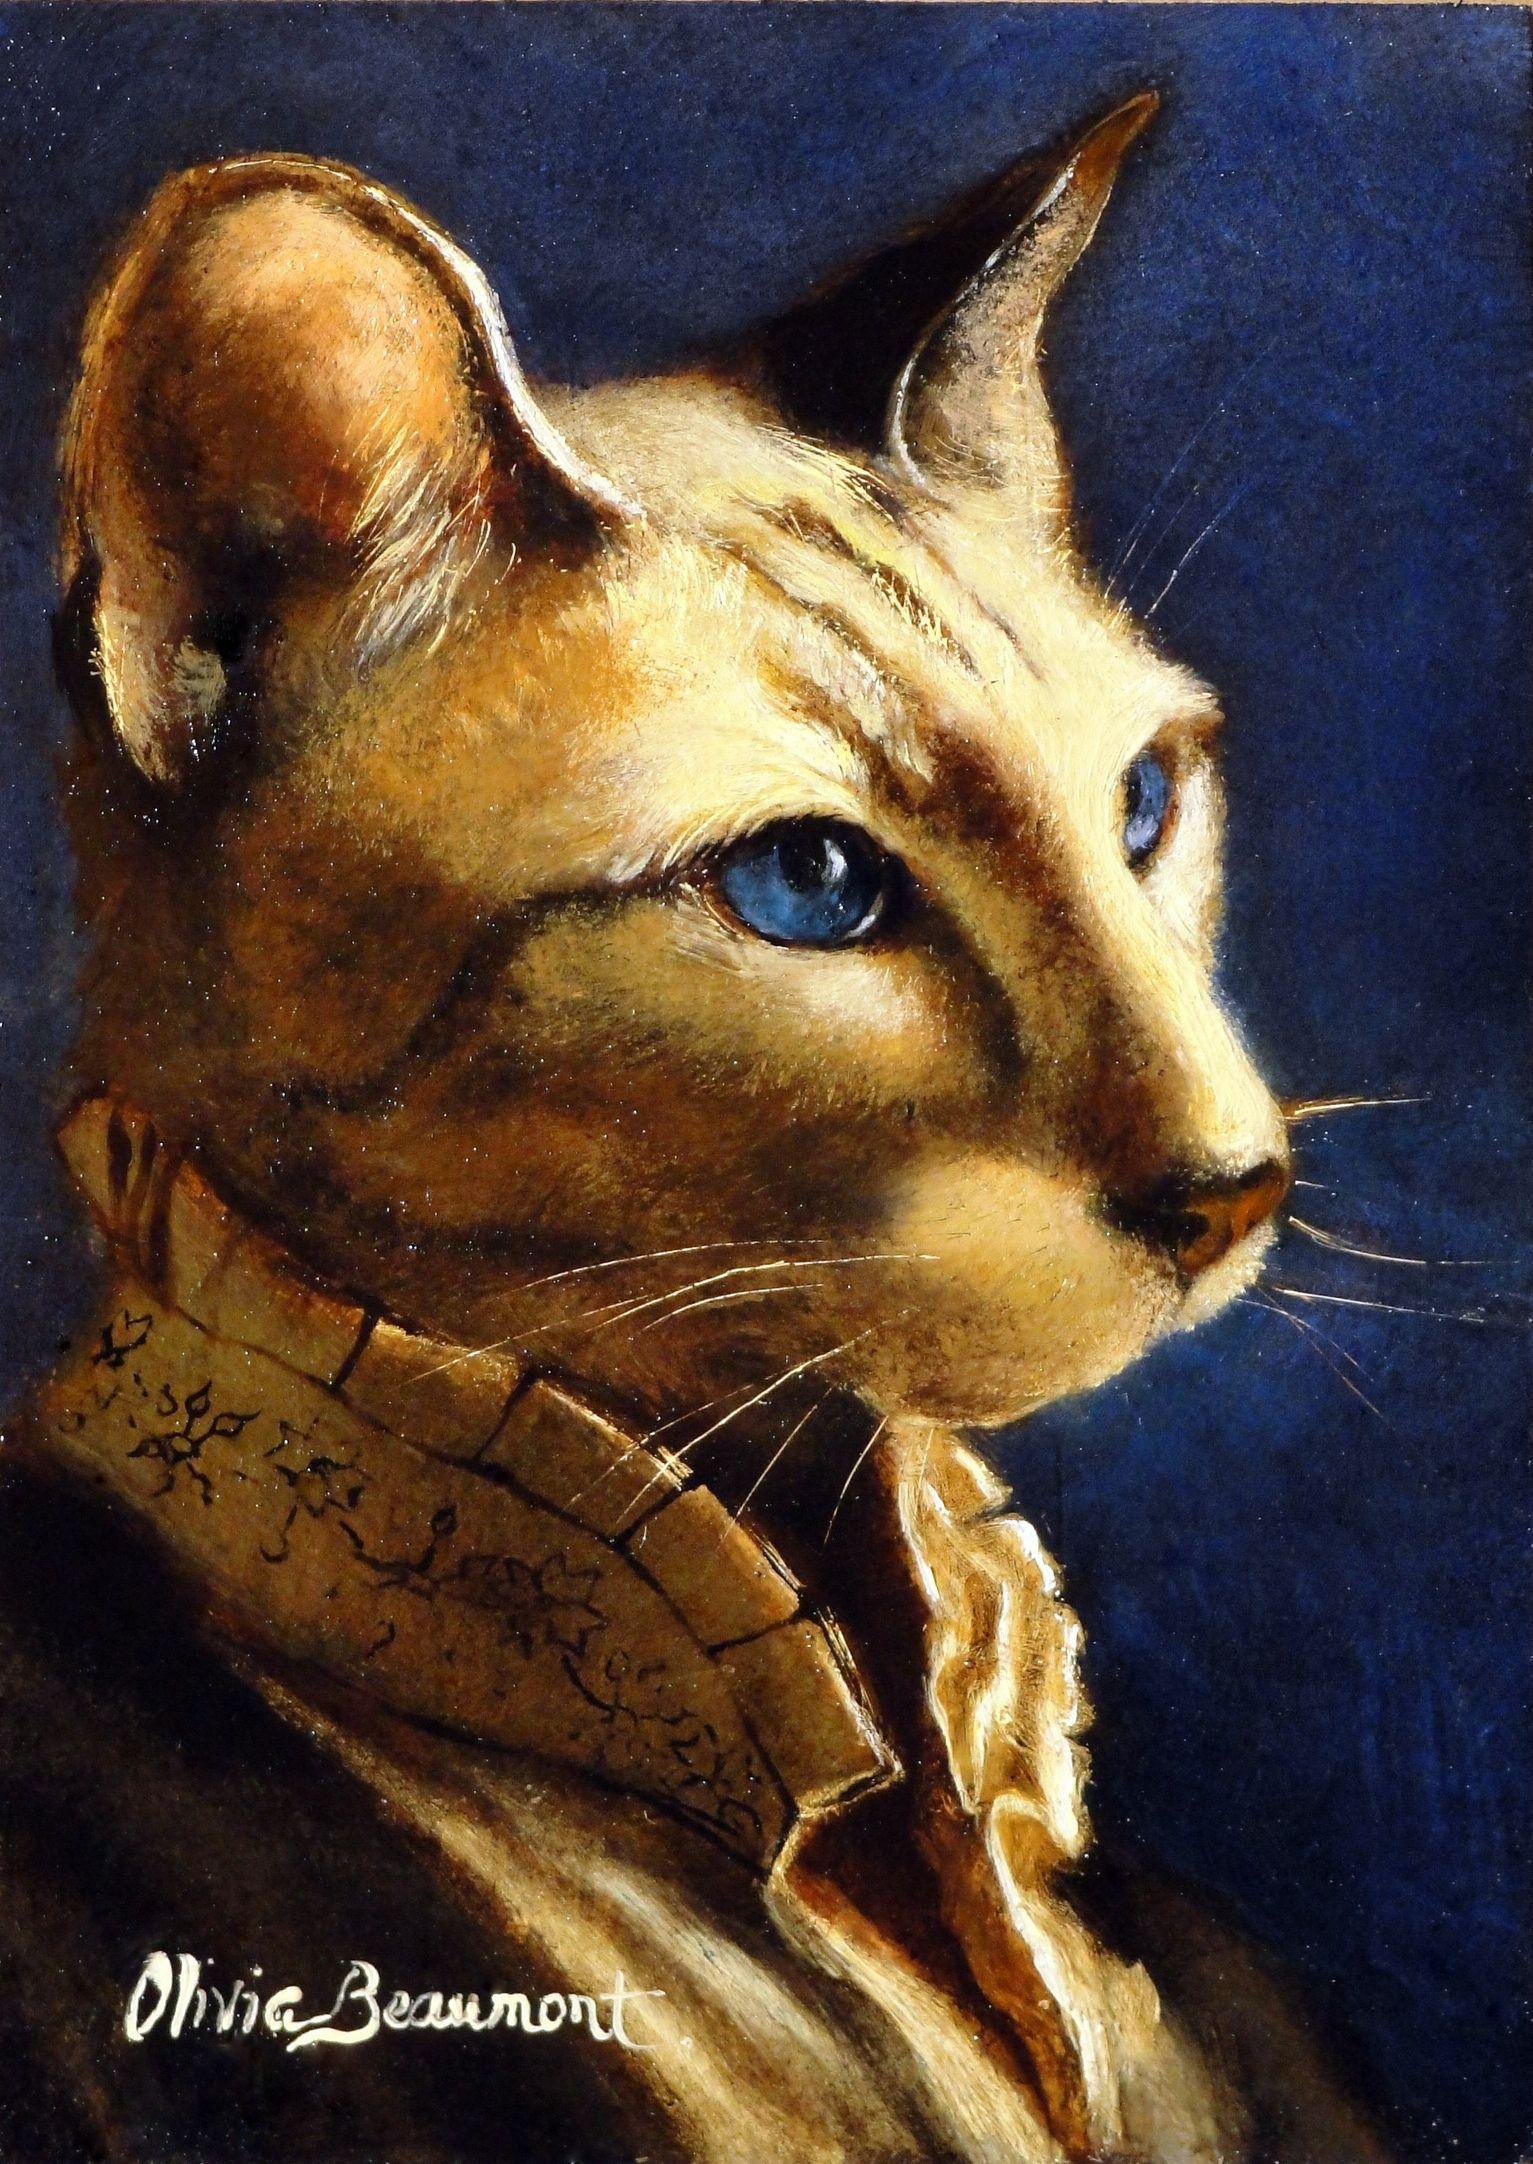 Spoof Siamese Cat Print Mona Kitty original by I Garmashova